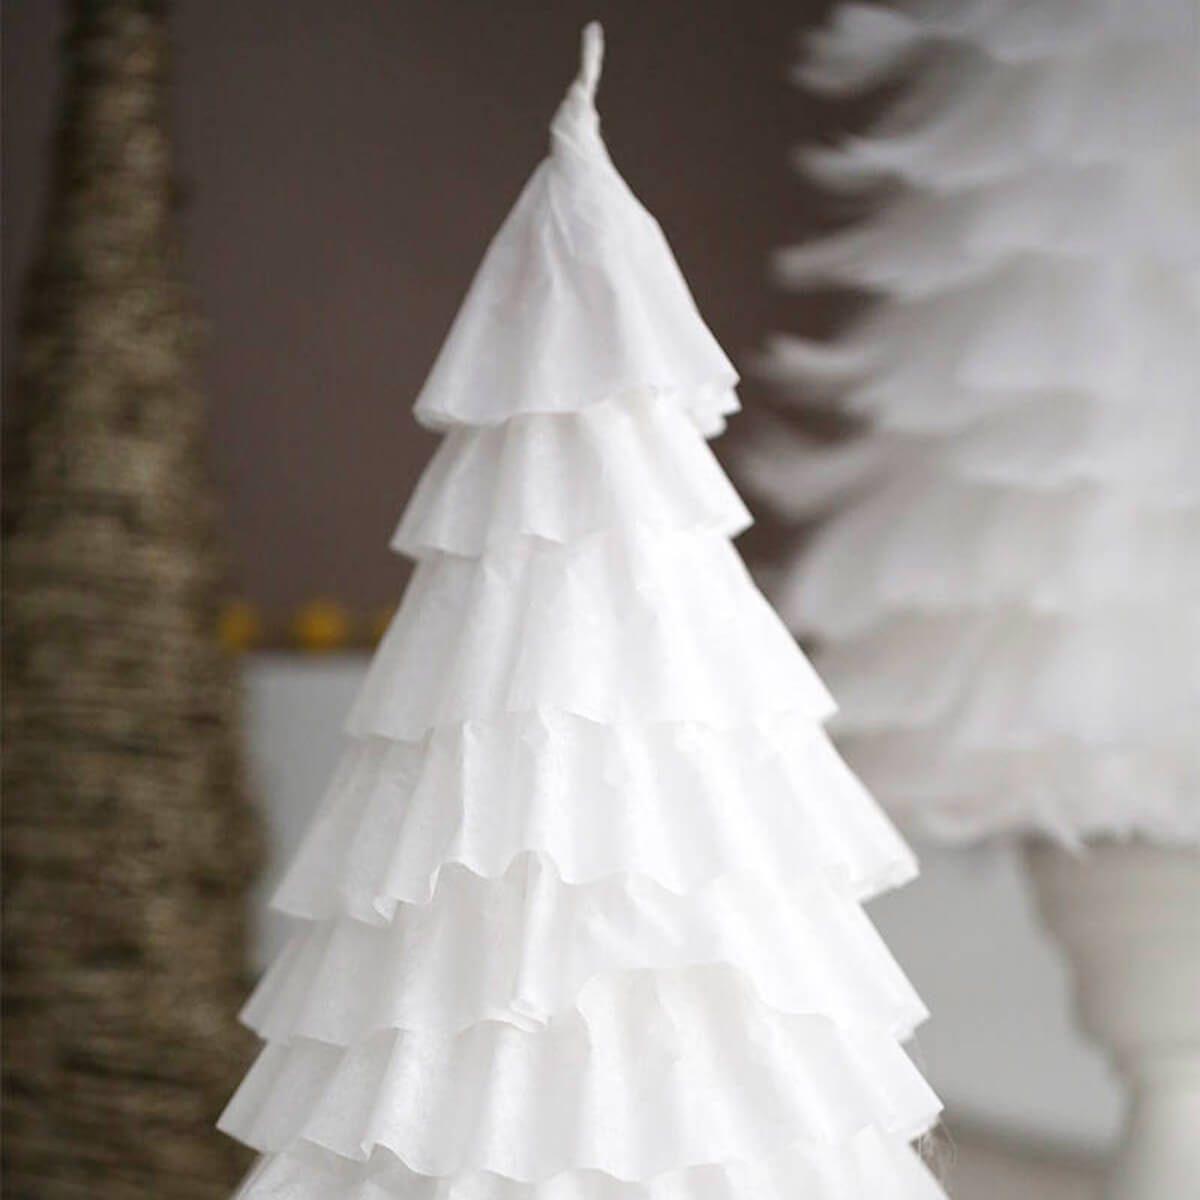 15 Last-Minute Holiday Decorating Ideas | The Family Handyman